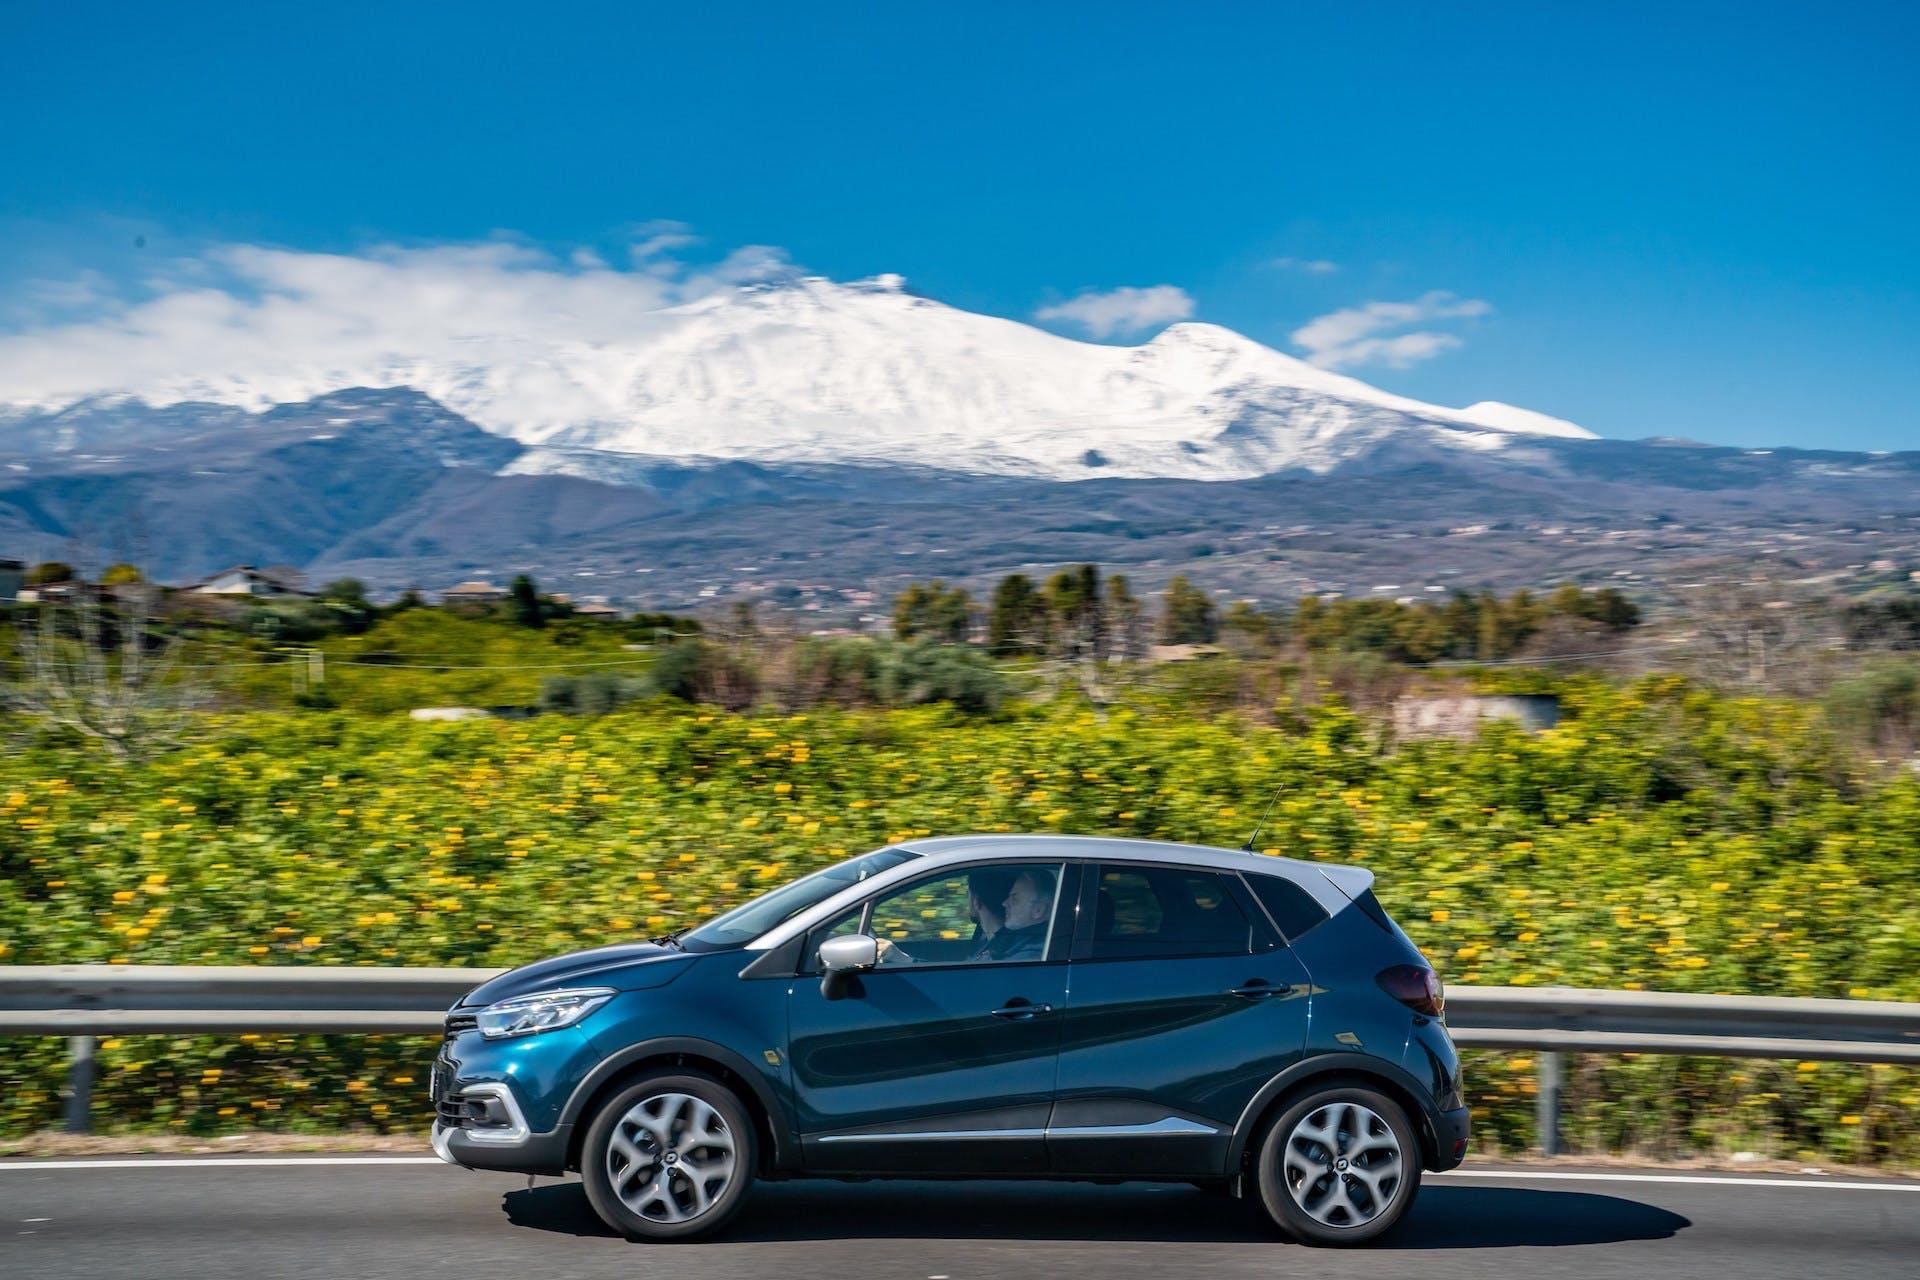 Renault Captur 2019 laterale blu Etna